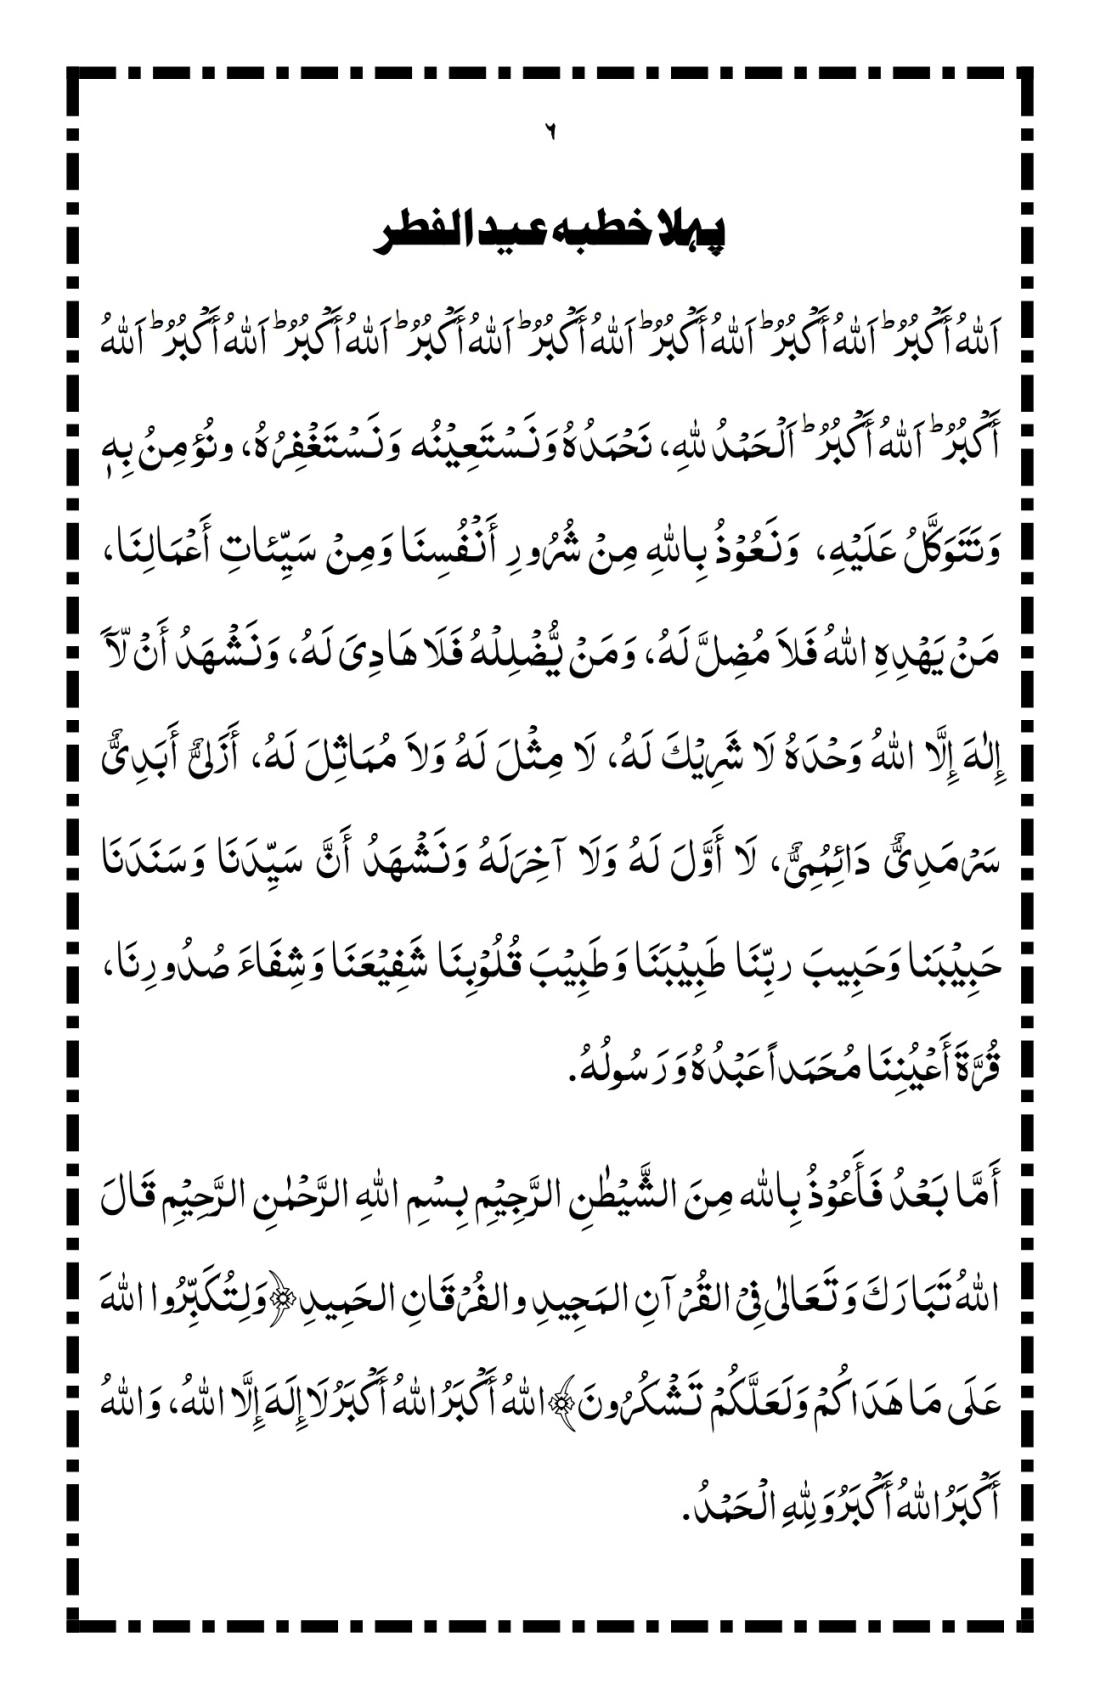 khutba-eif-ul-fitr-adha-1